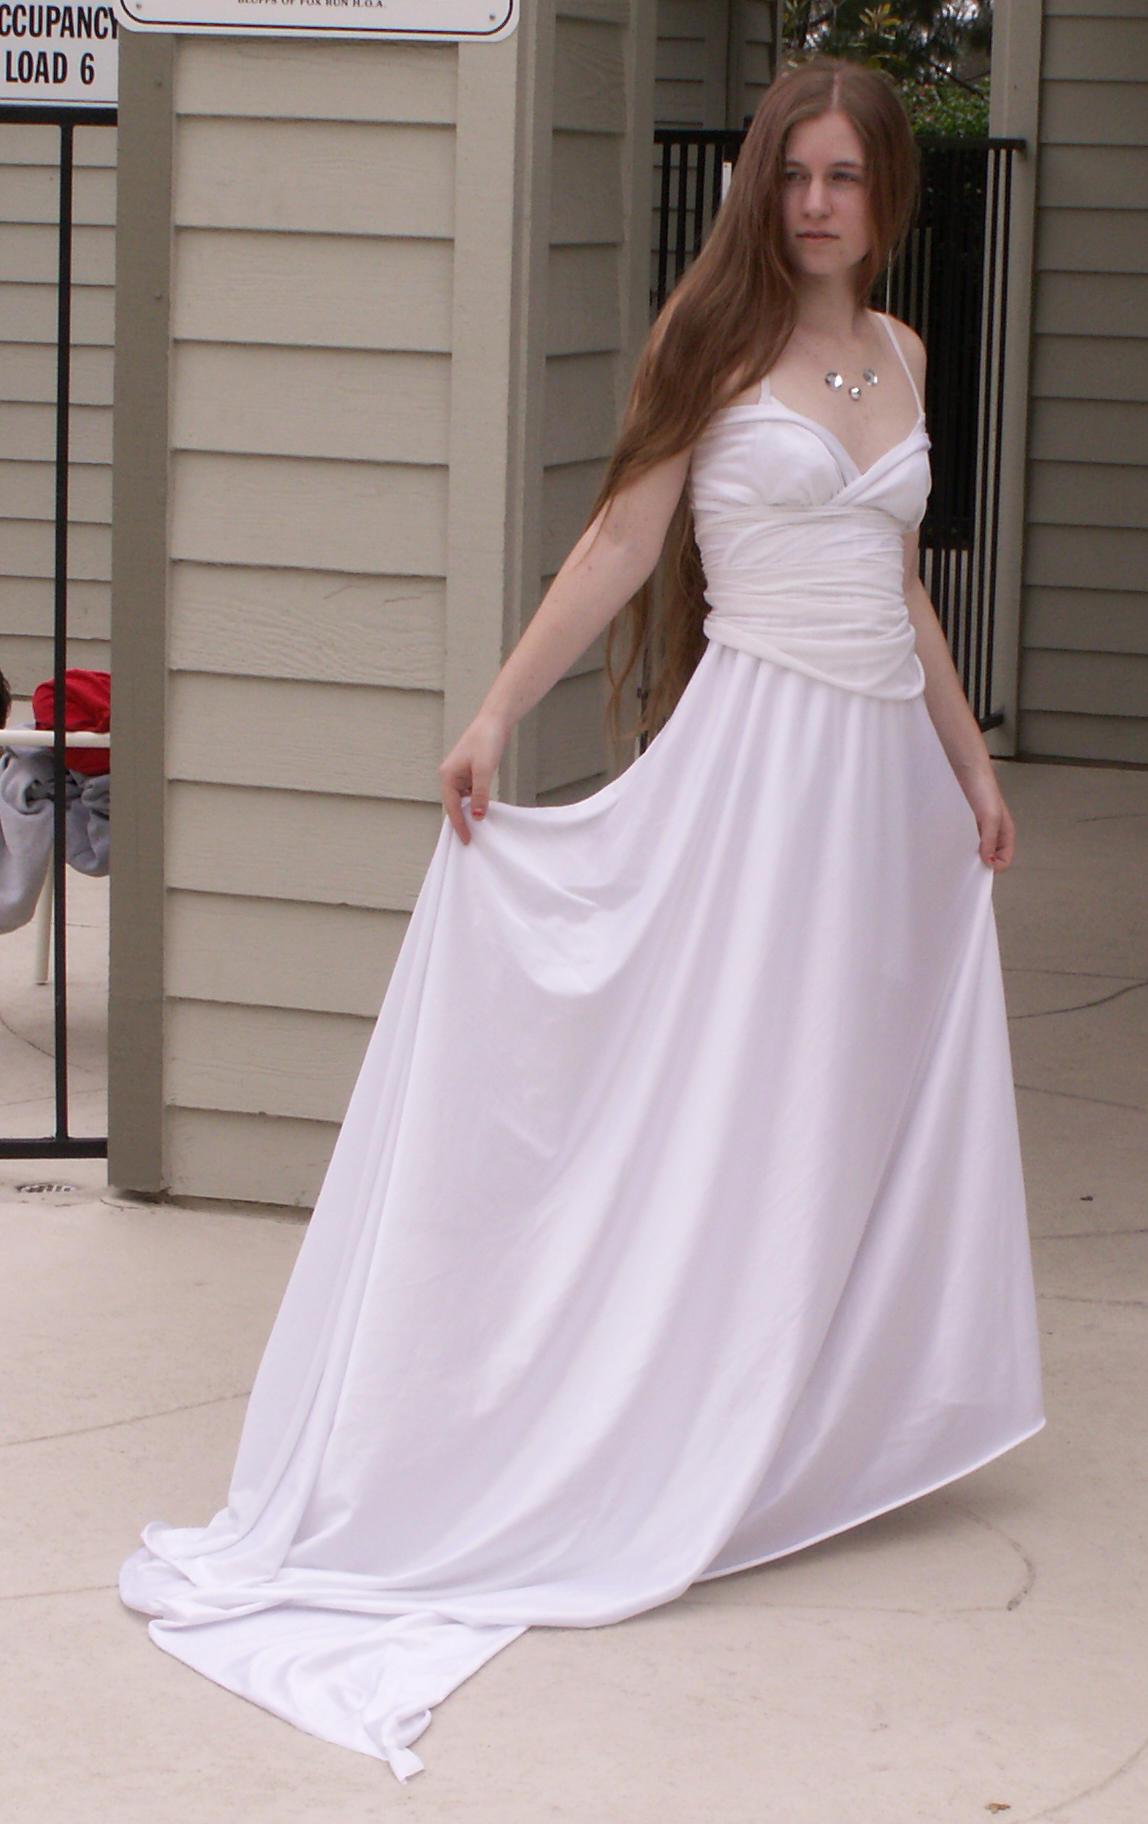 Makeshift princess dress by Sinned-angel-stock